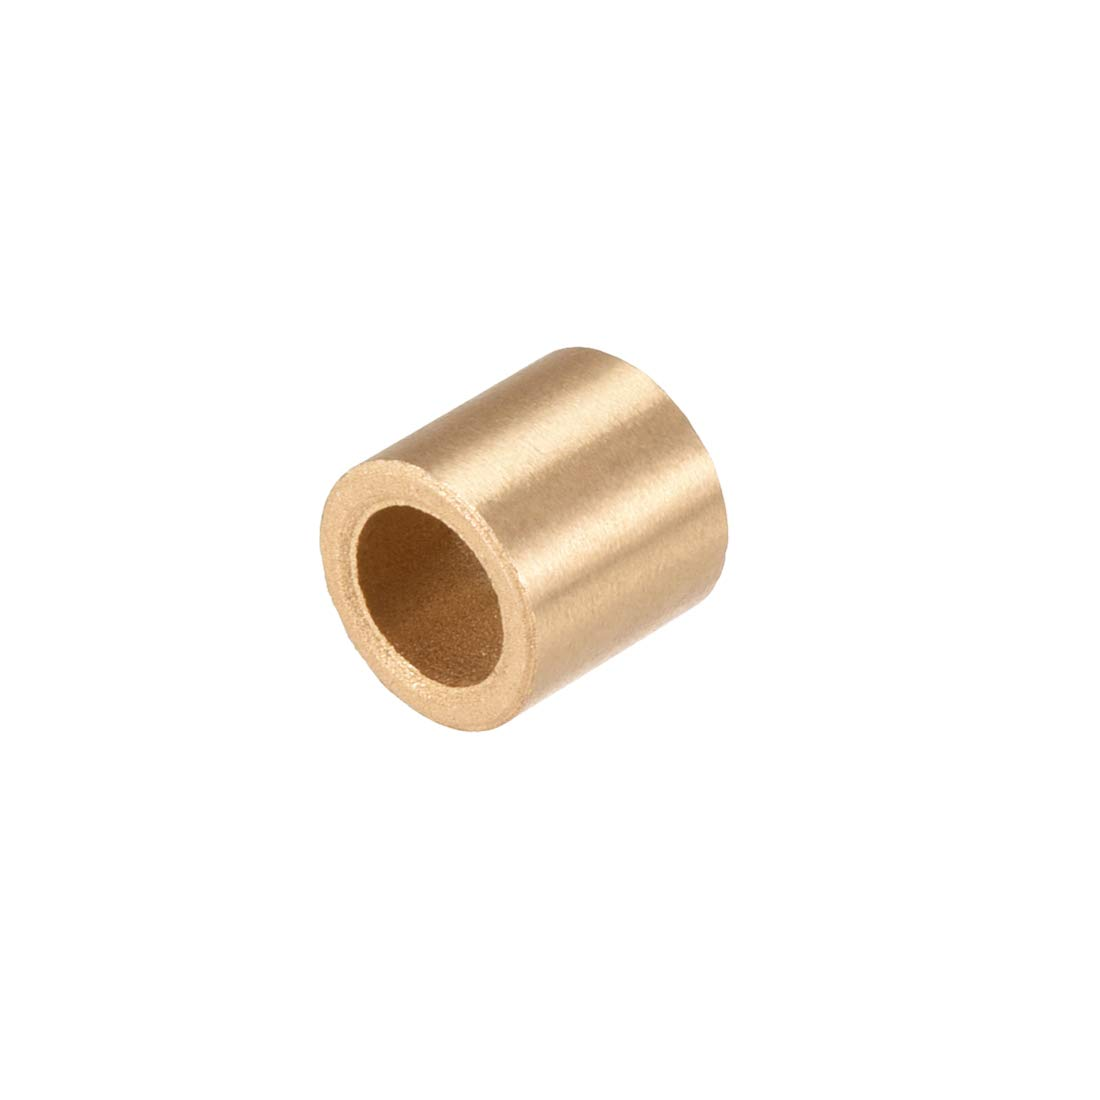 sourcing map 4mm x 8mm x 6mm Self-lubricating Bushing Sleeve Brass Bearings 10PCS